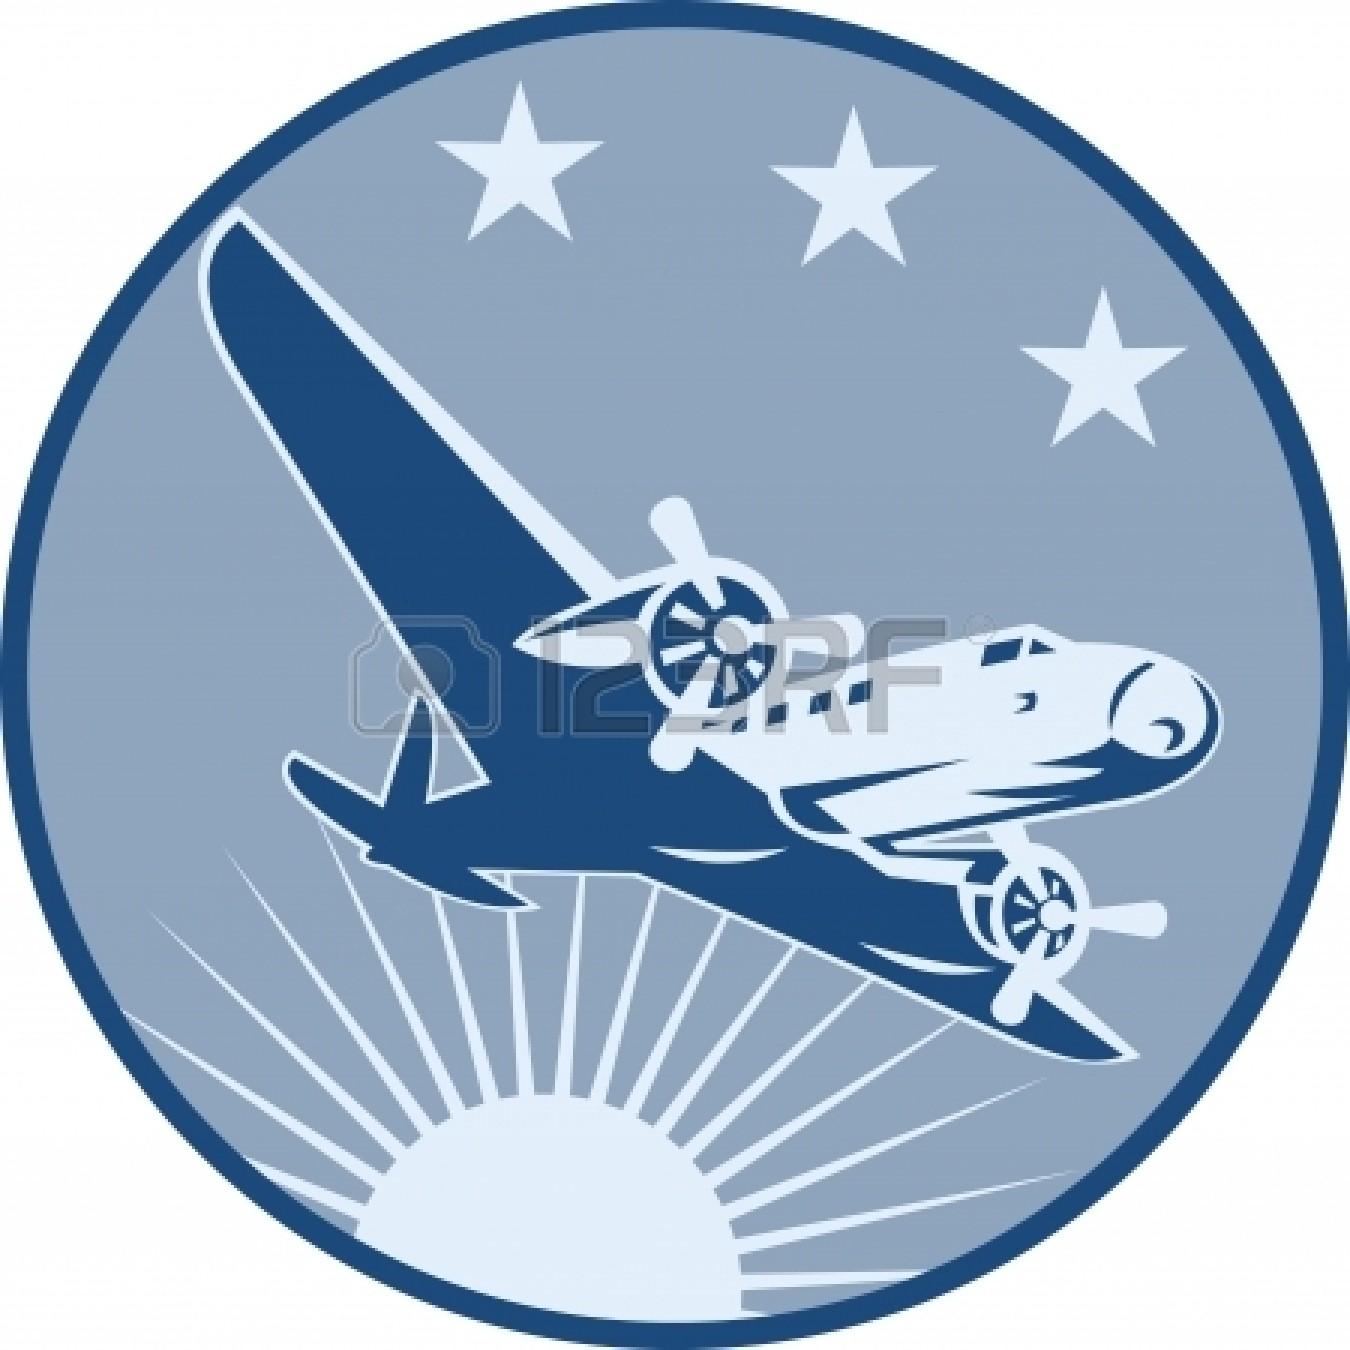 Biplane clipart illustration. Vintage plane panda free